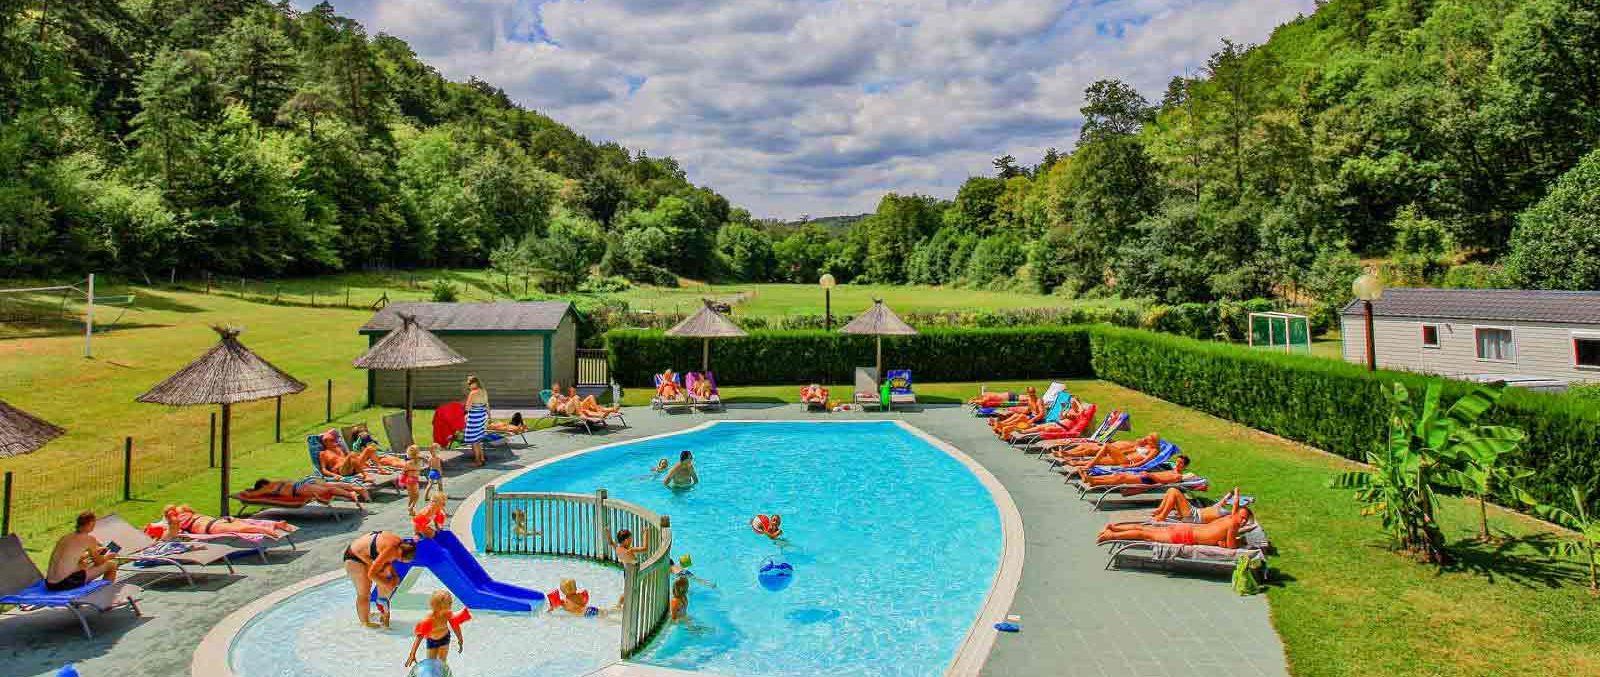 camping avec piscine Dordogne